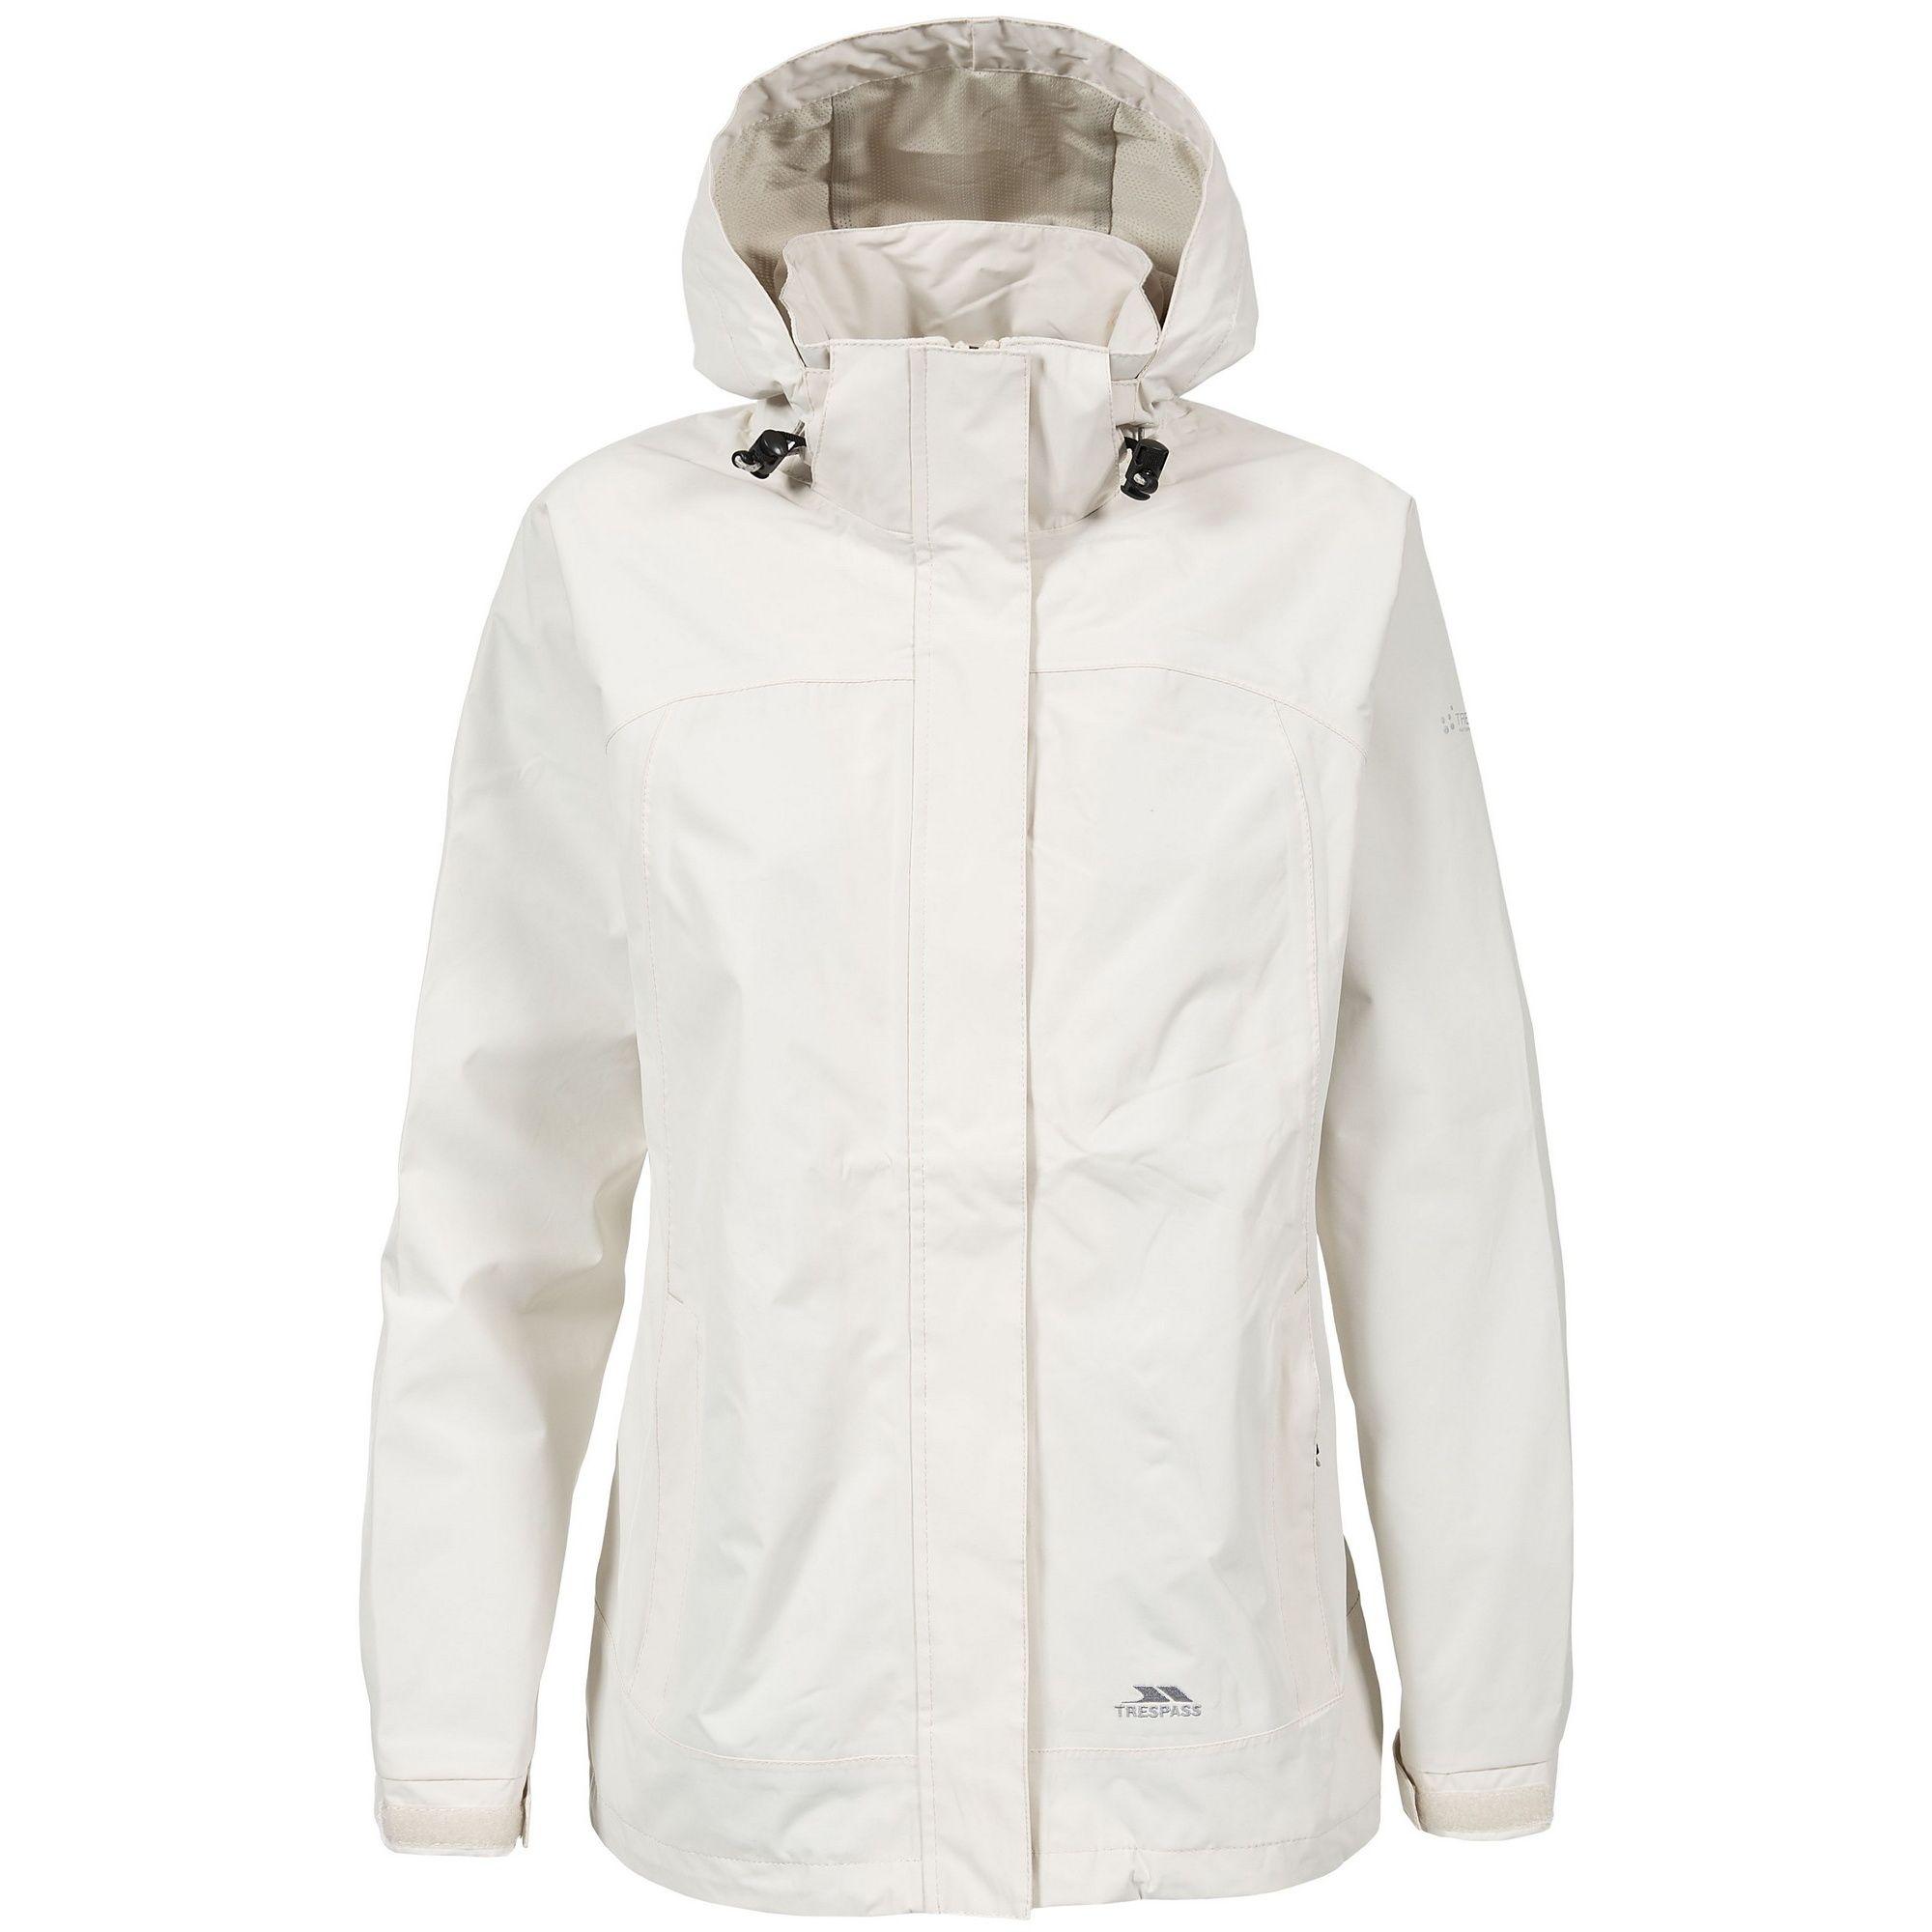 Trespass Womens/Ladies Nasu II Waterproof Shell Jacket